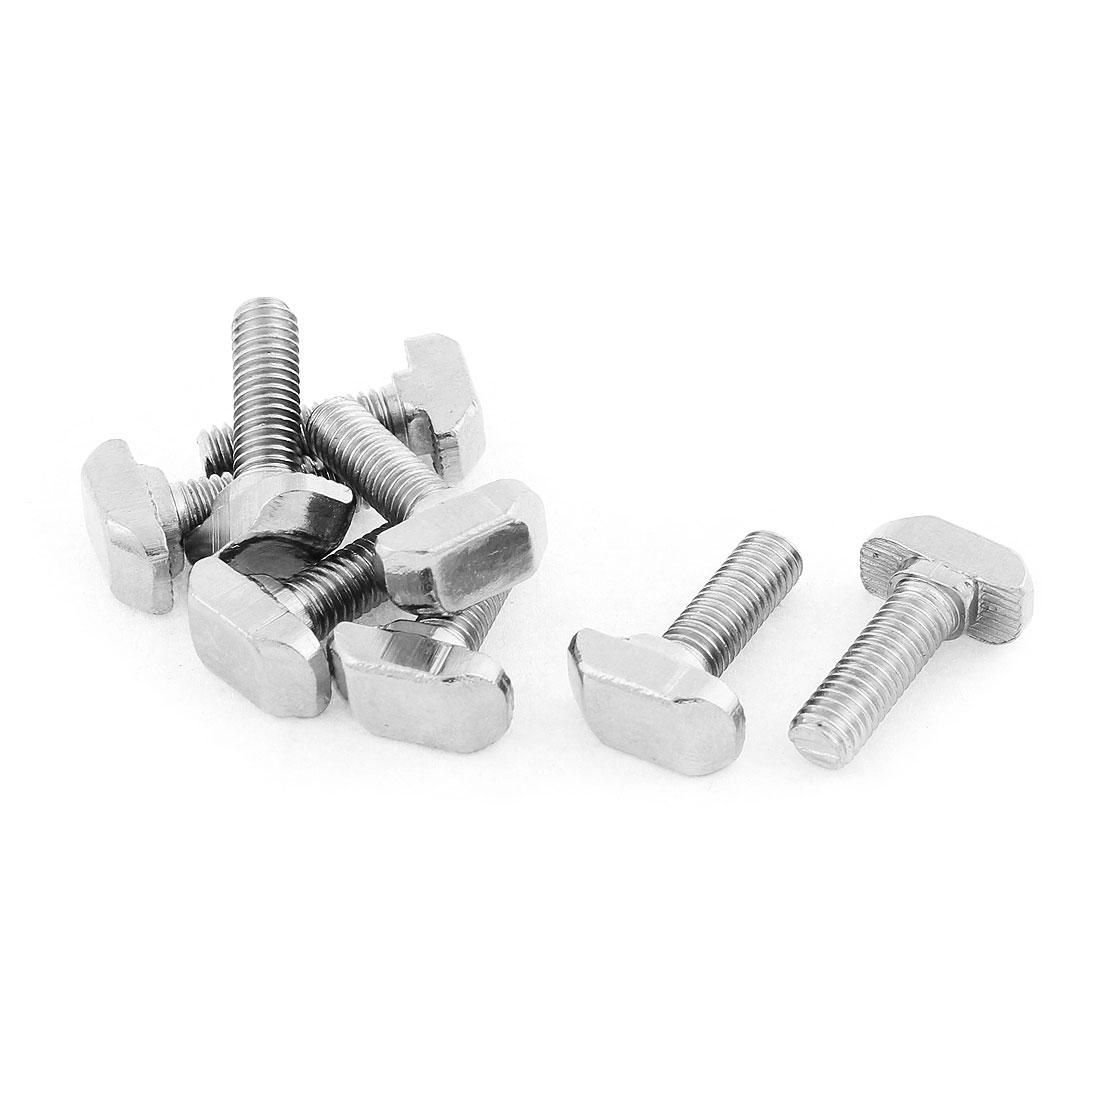 M6 Thread Metal T-Slot Drop-In Stud Sliding Screw Bolt Silver Tone 8pcs